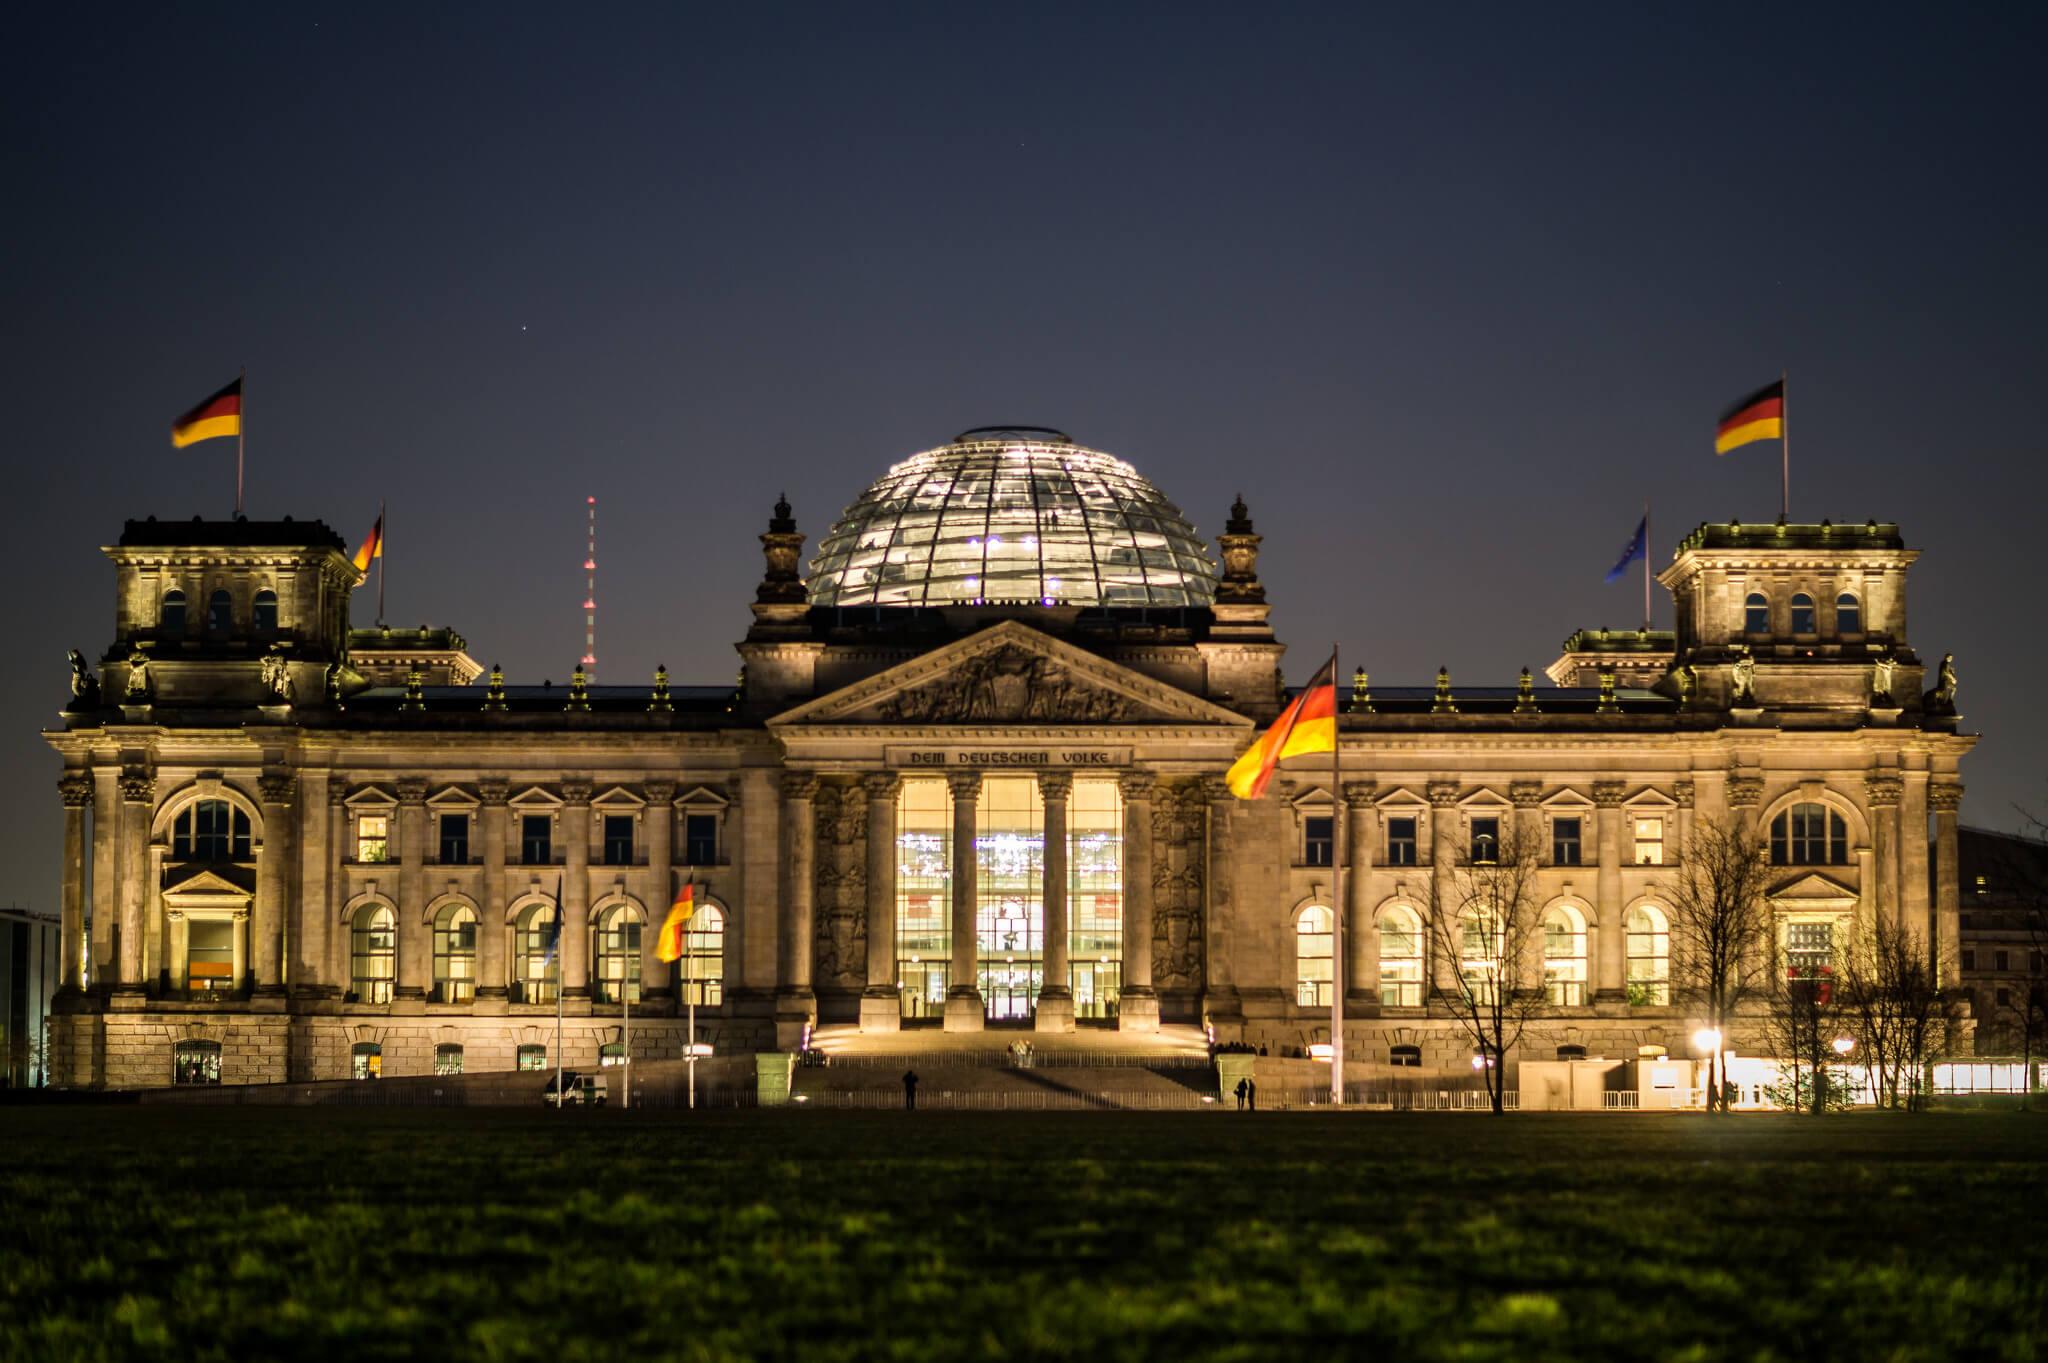 надевании протеза фототур в берлин стене